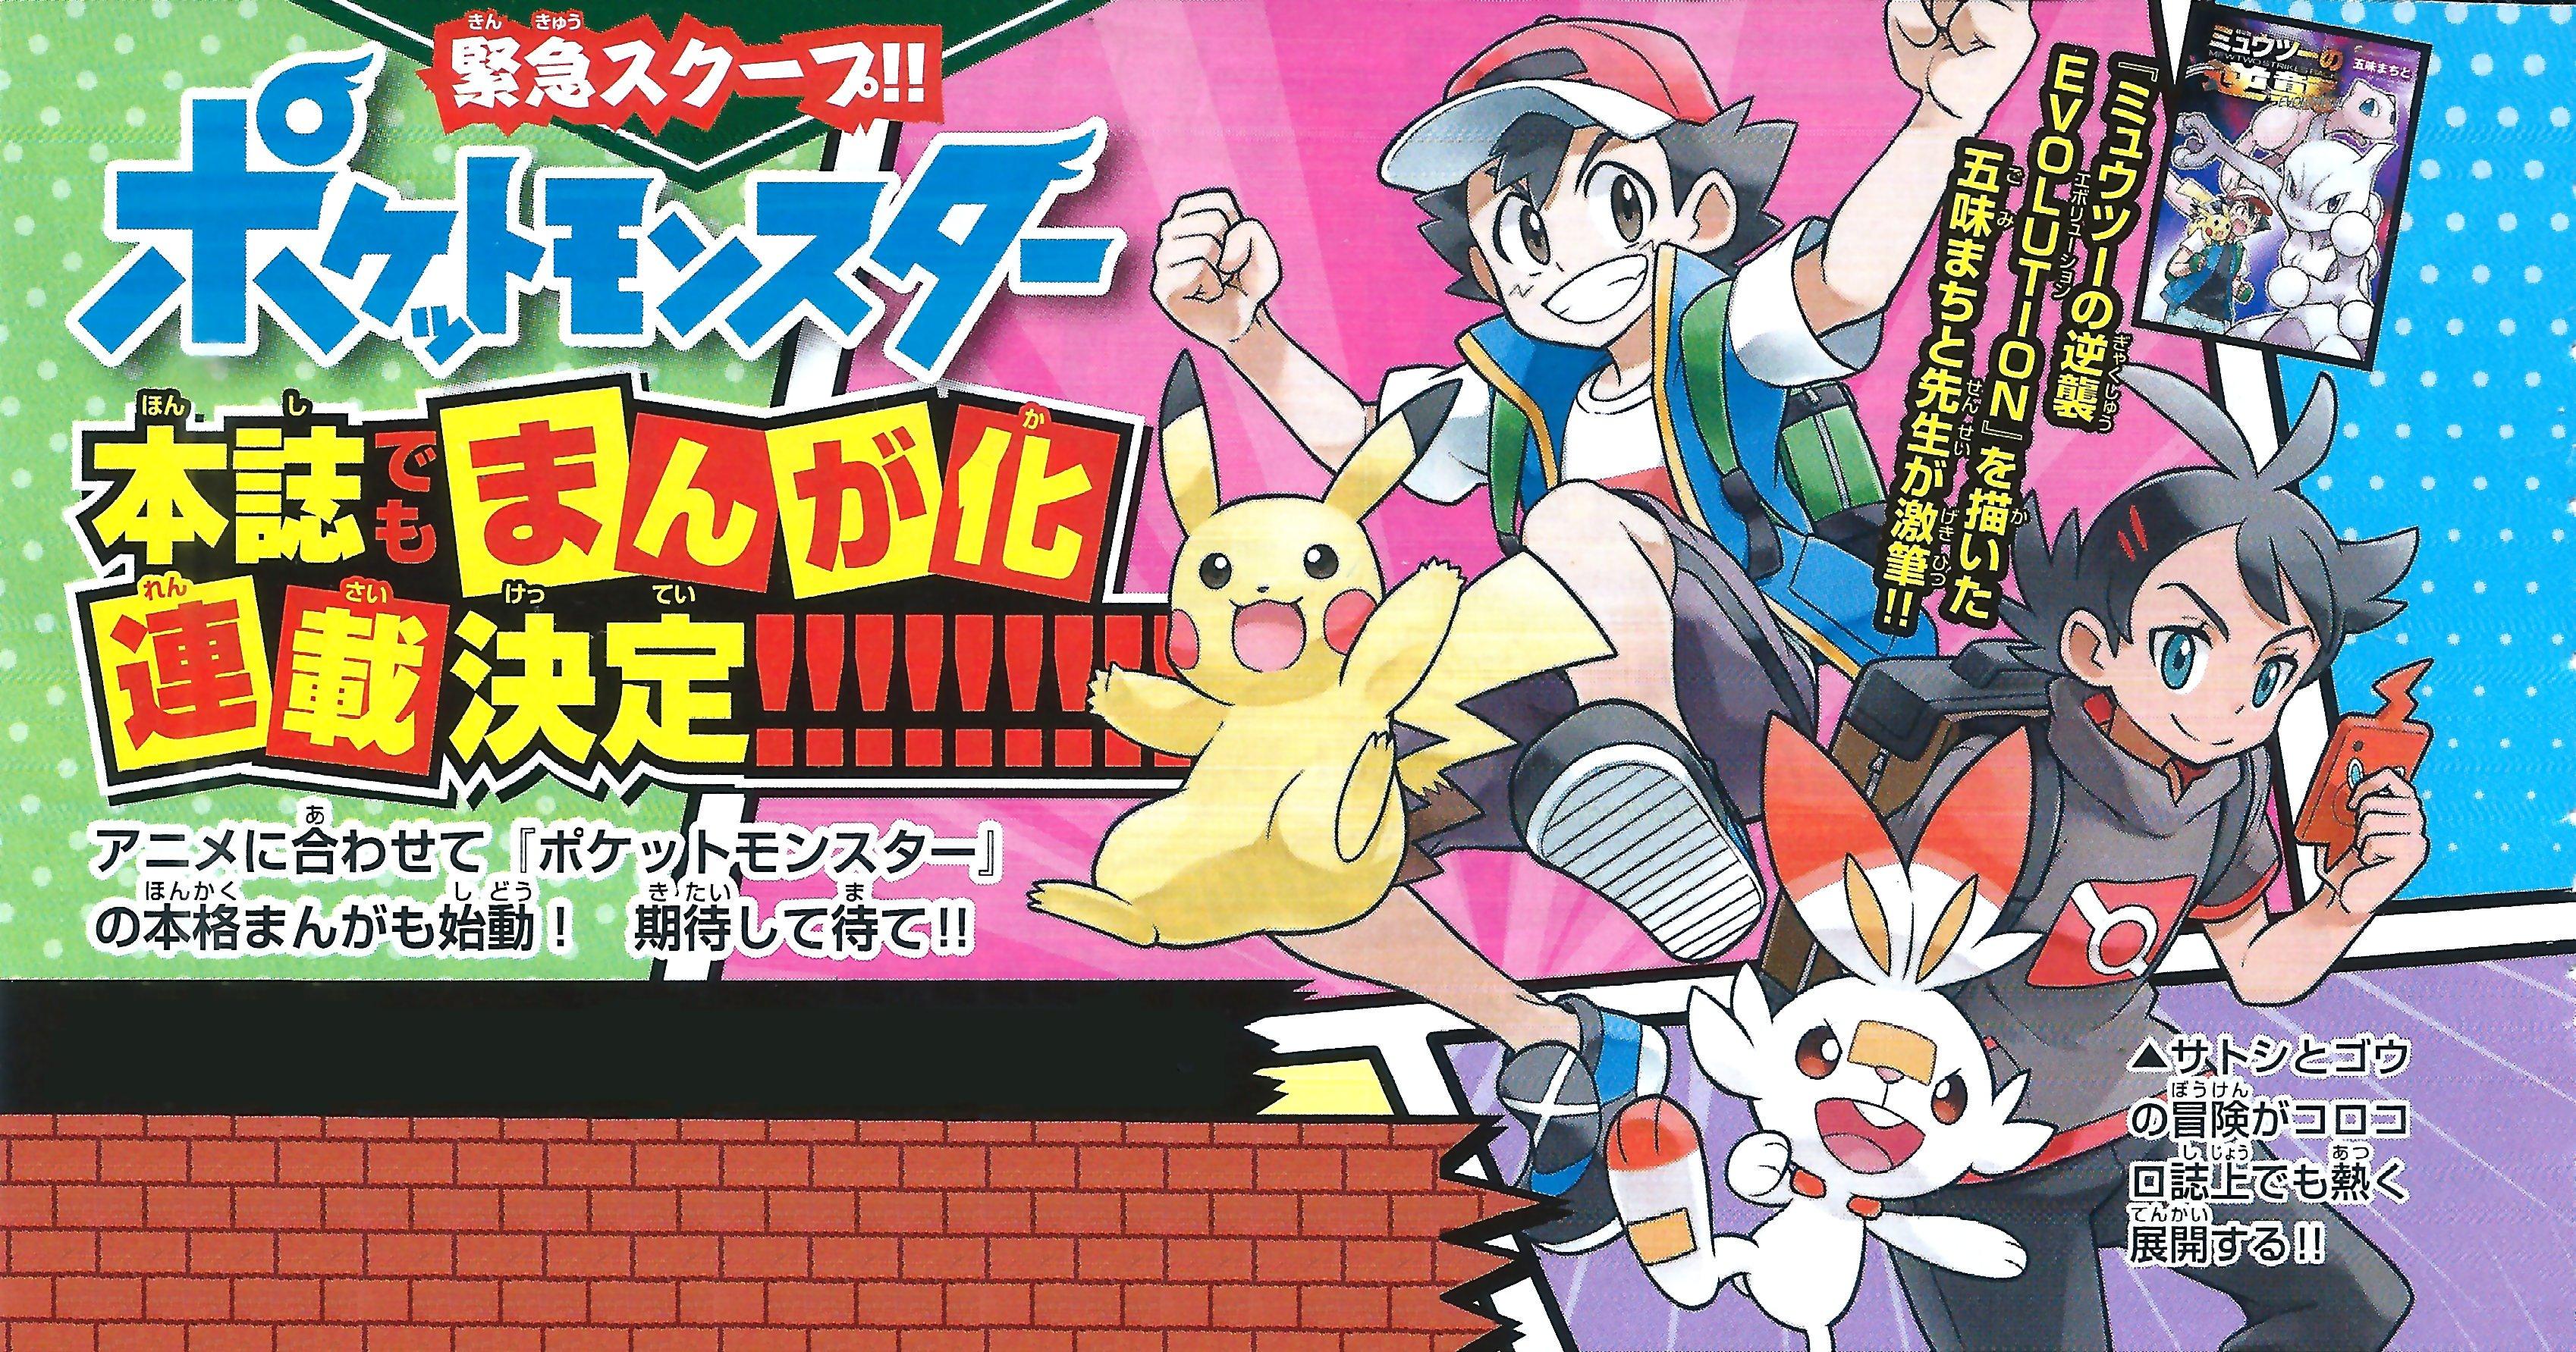 Nuovo manga per i Pokemon